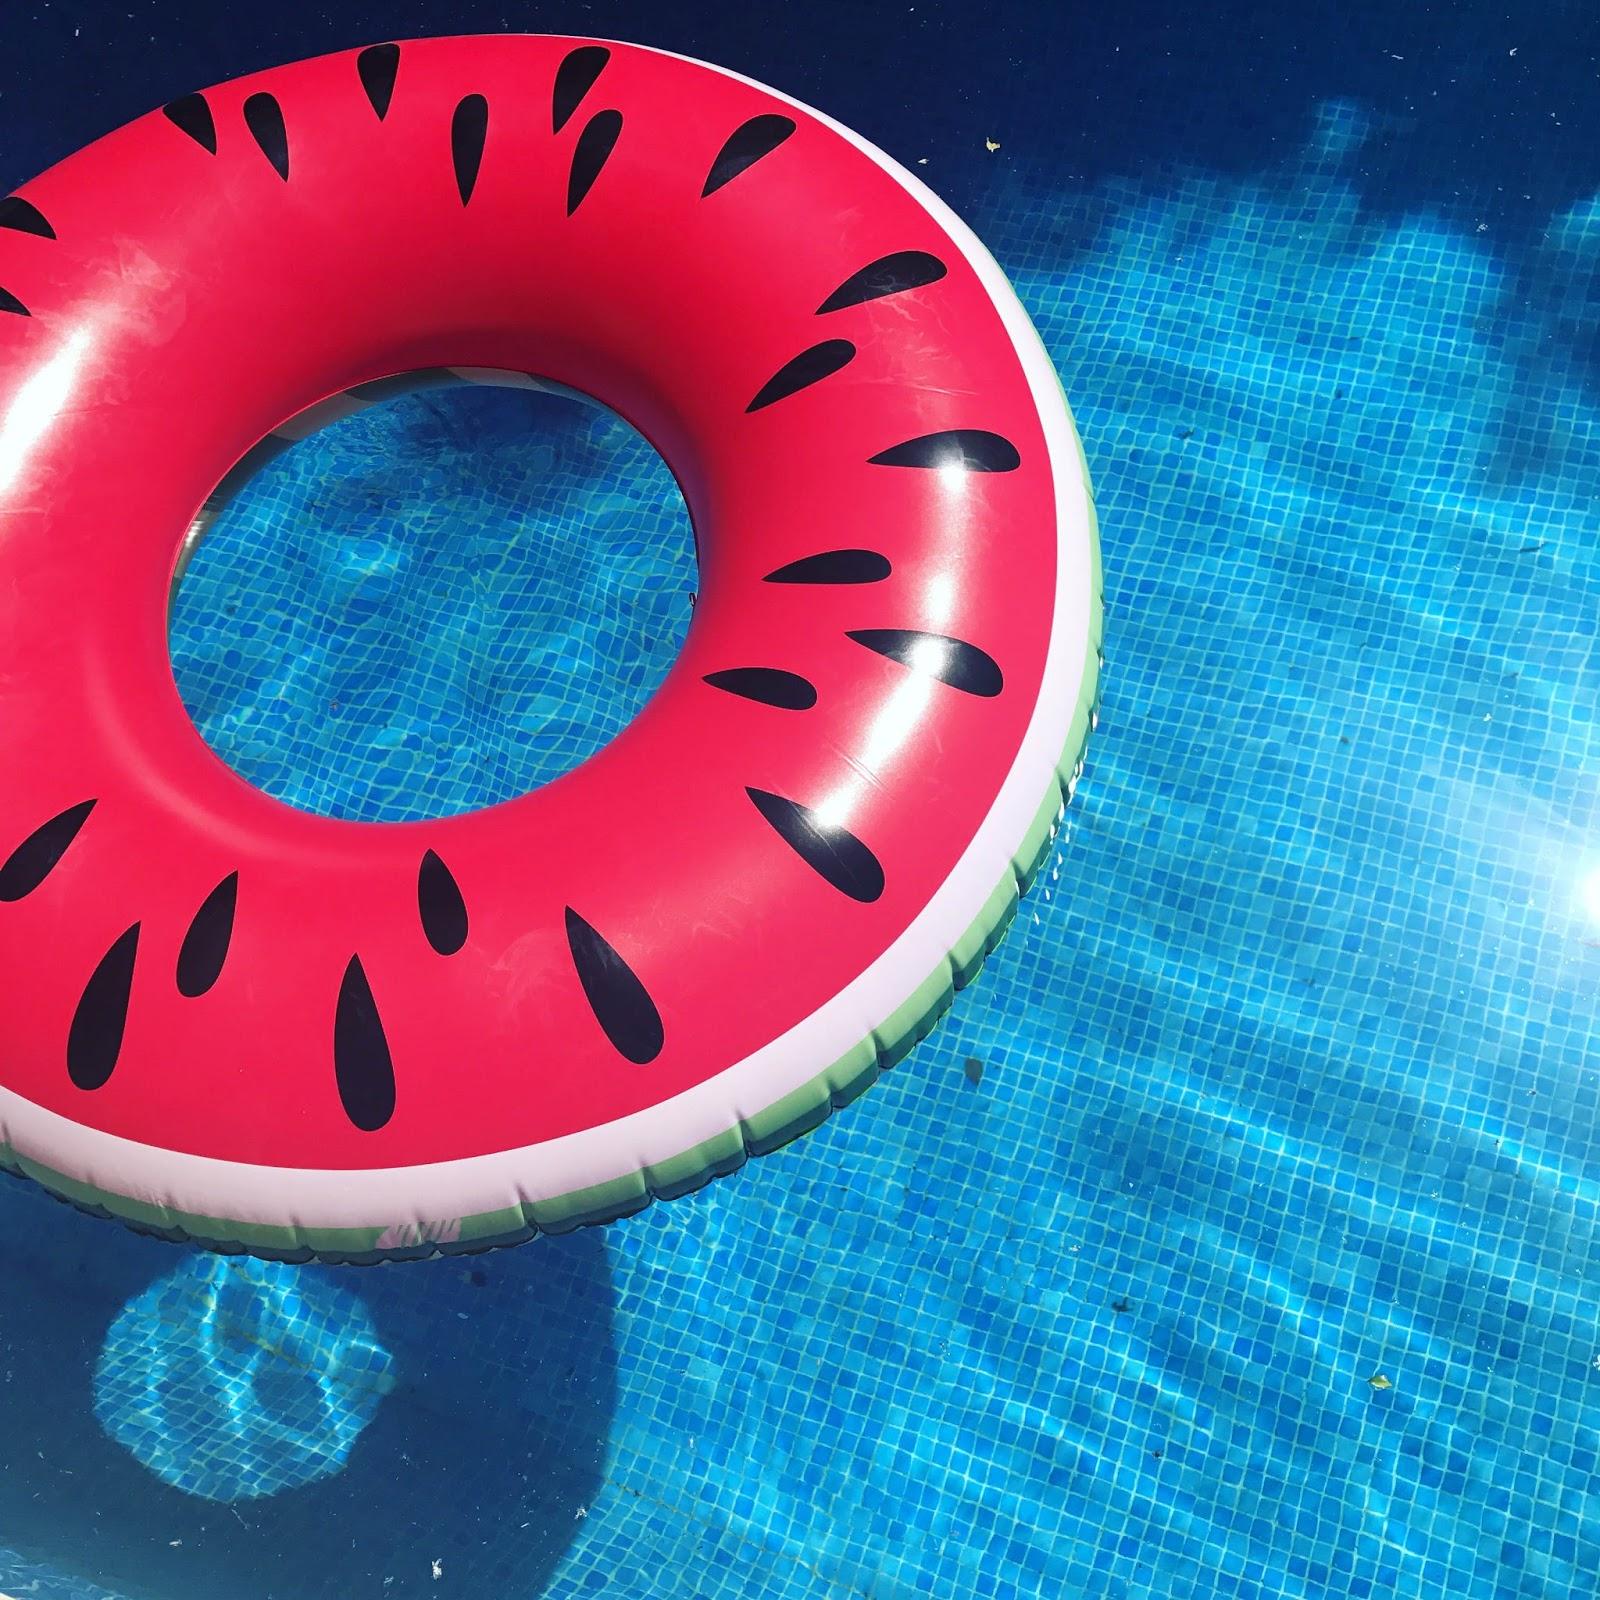 Watermelon Rubber Ring